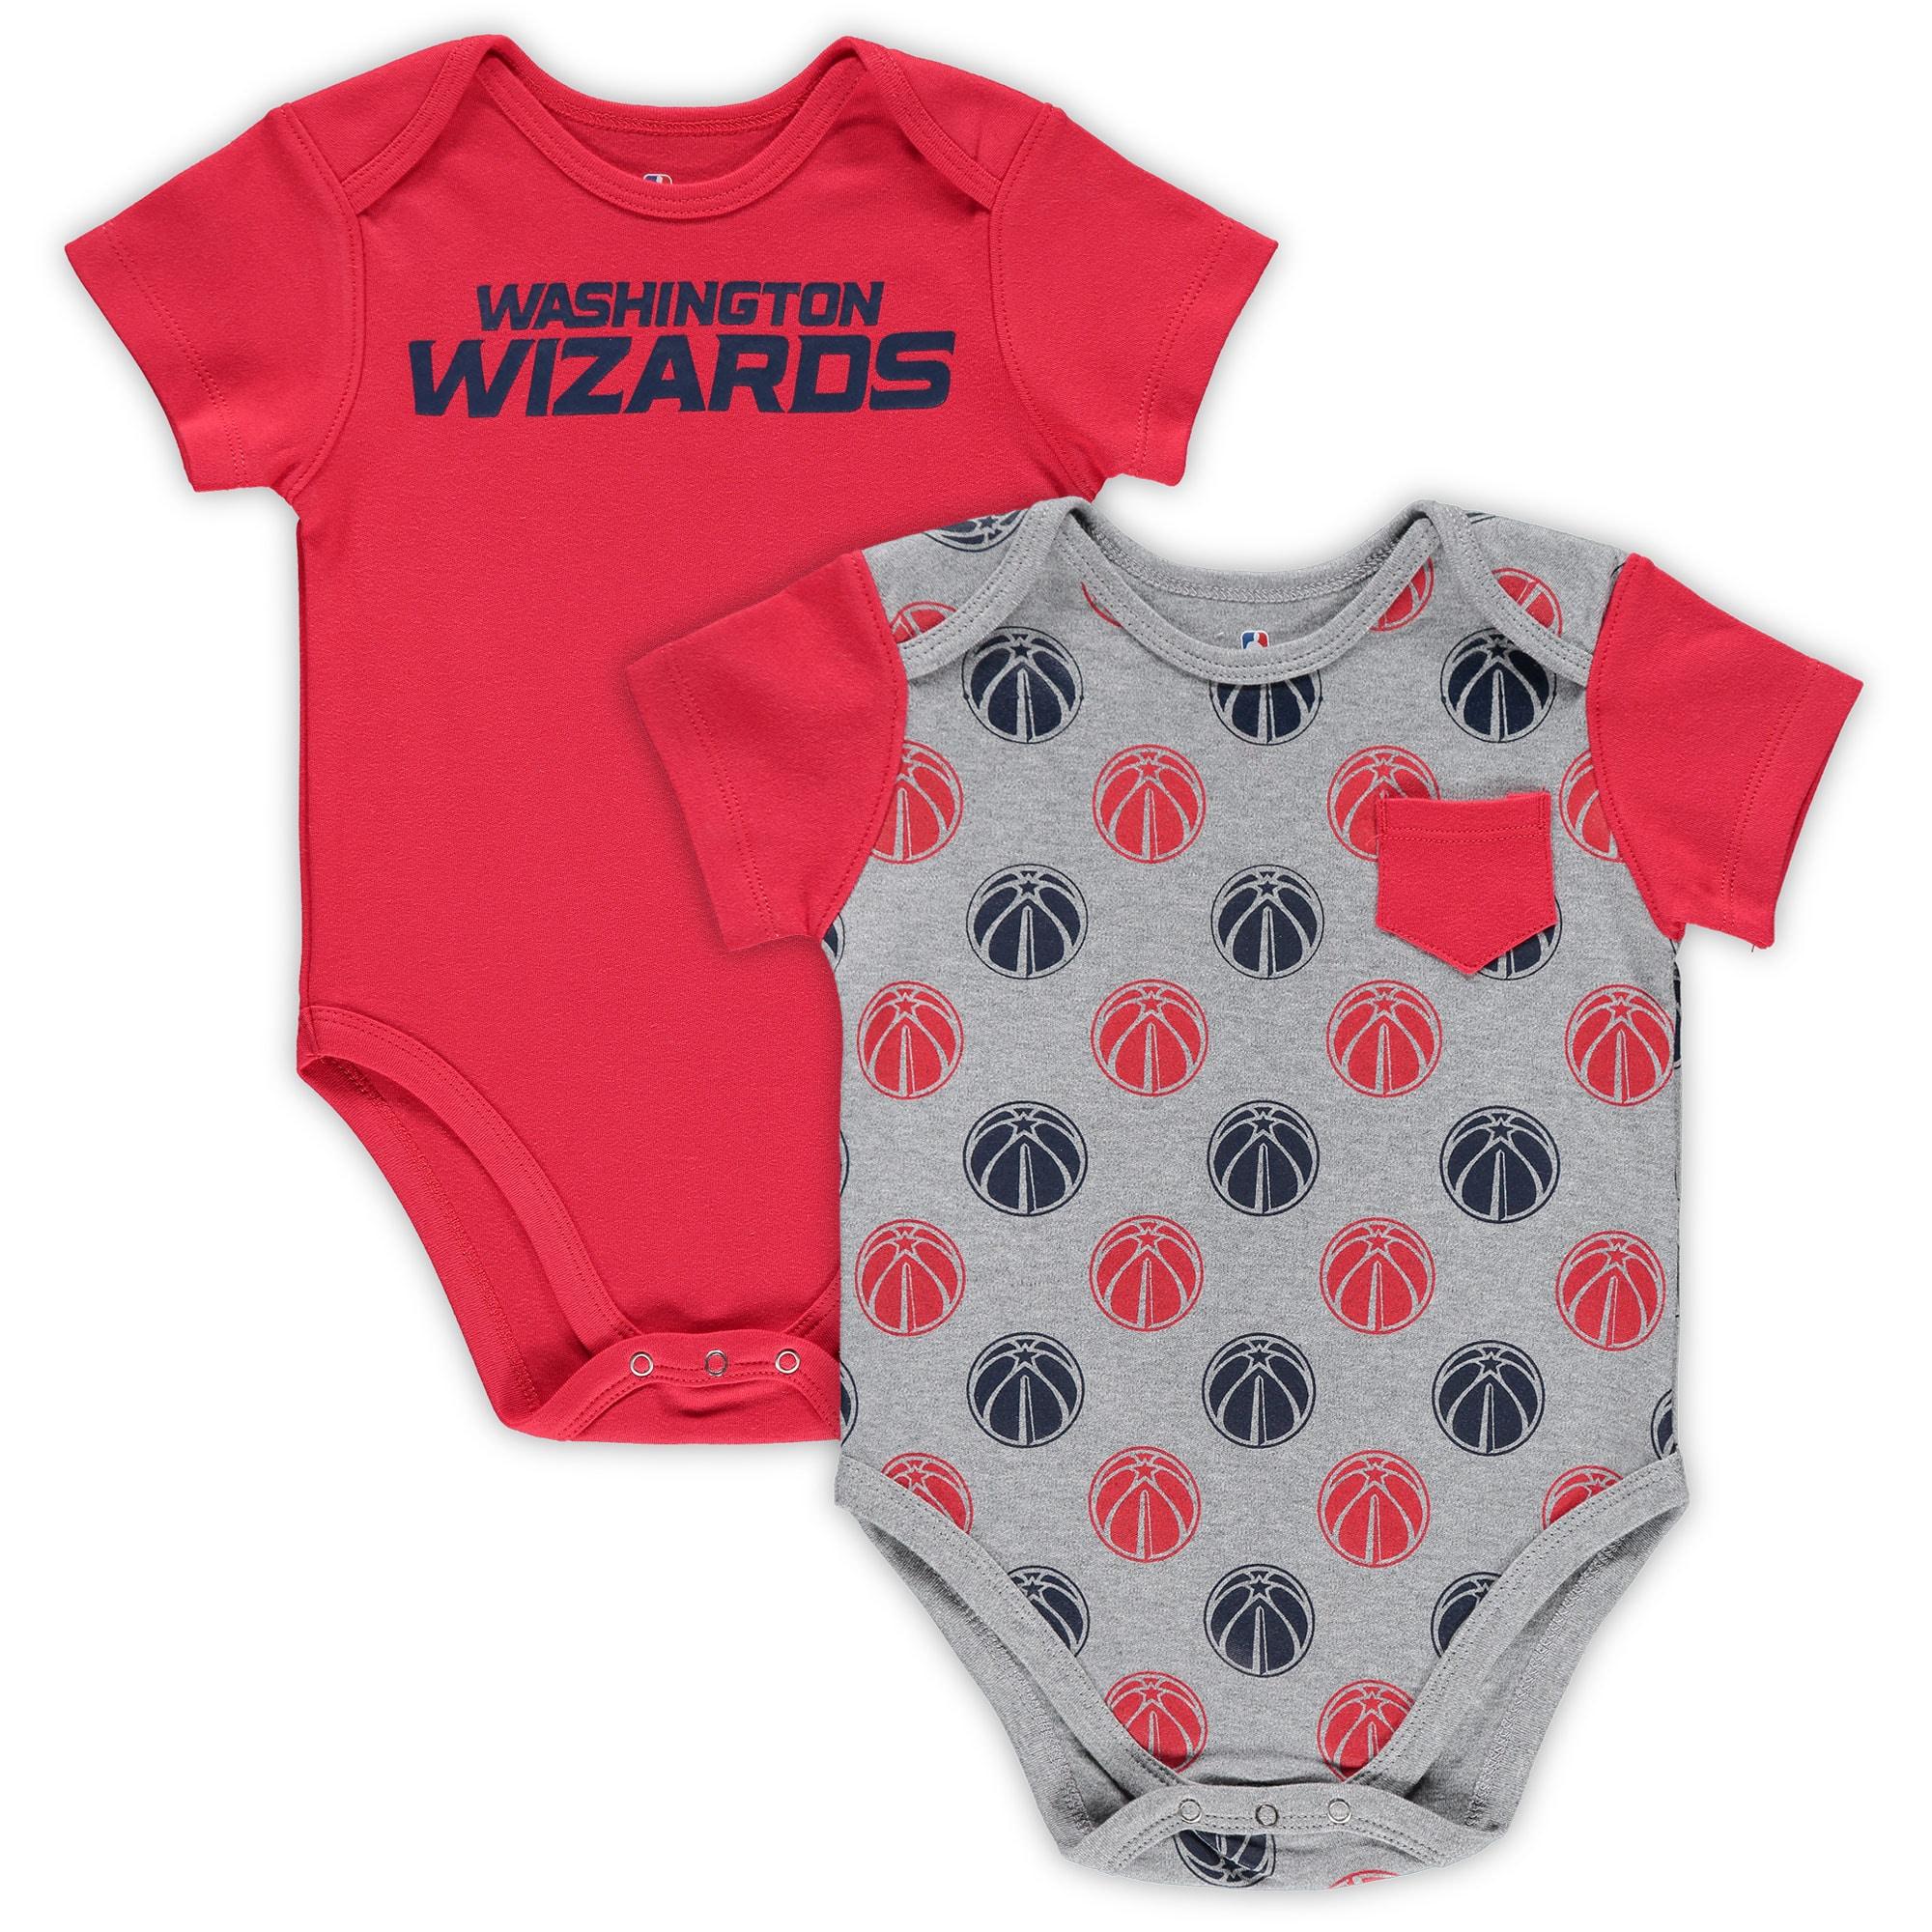 Washington Wizards Infant Little Baller 2-Pack Bodysuit Set - Red/Heathered Gray